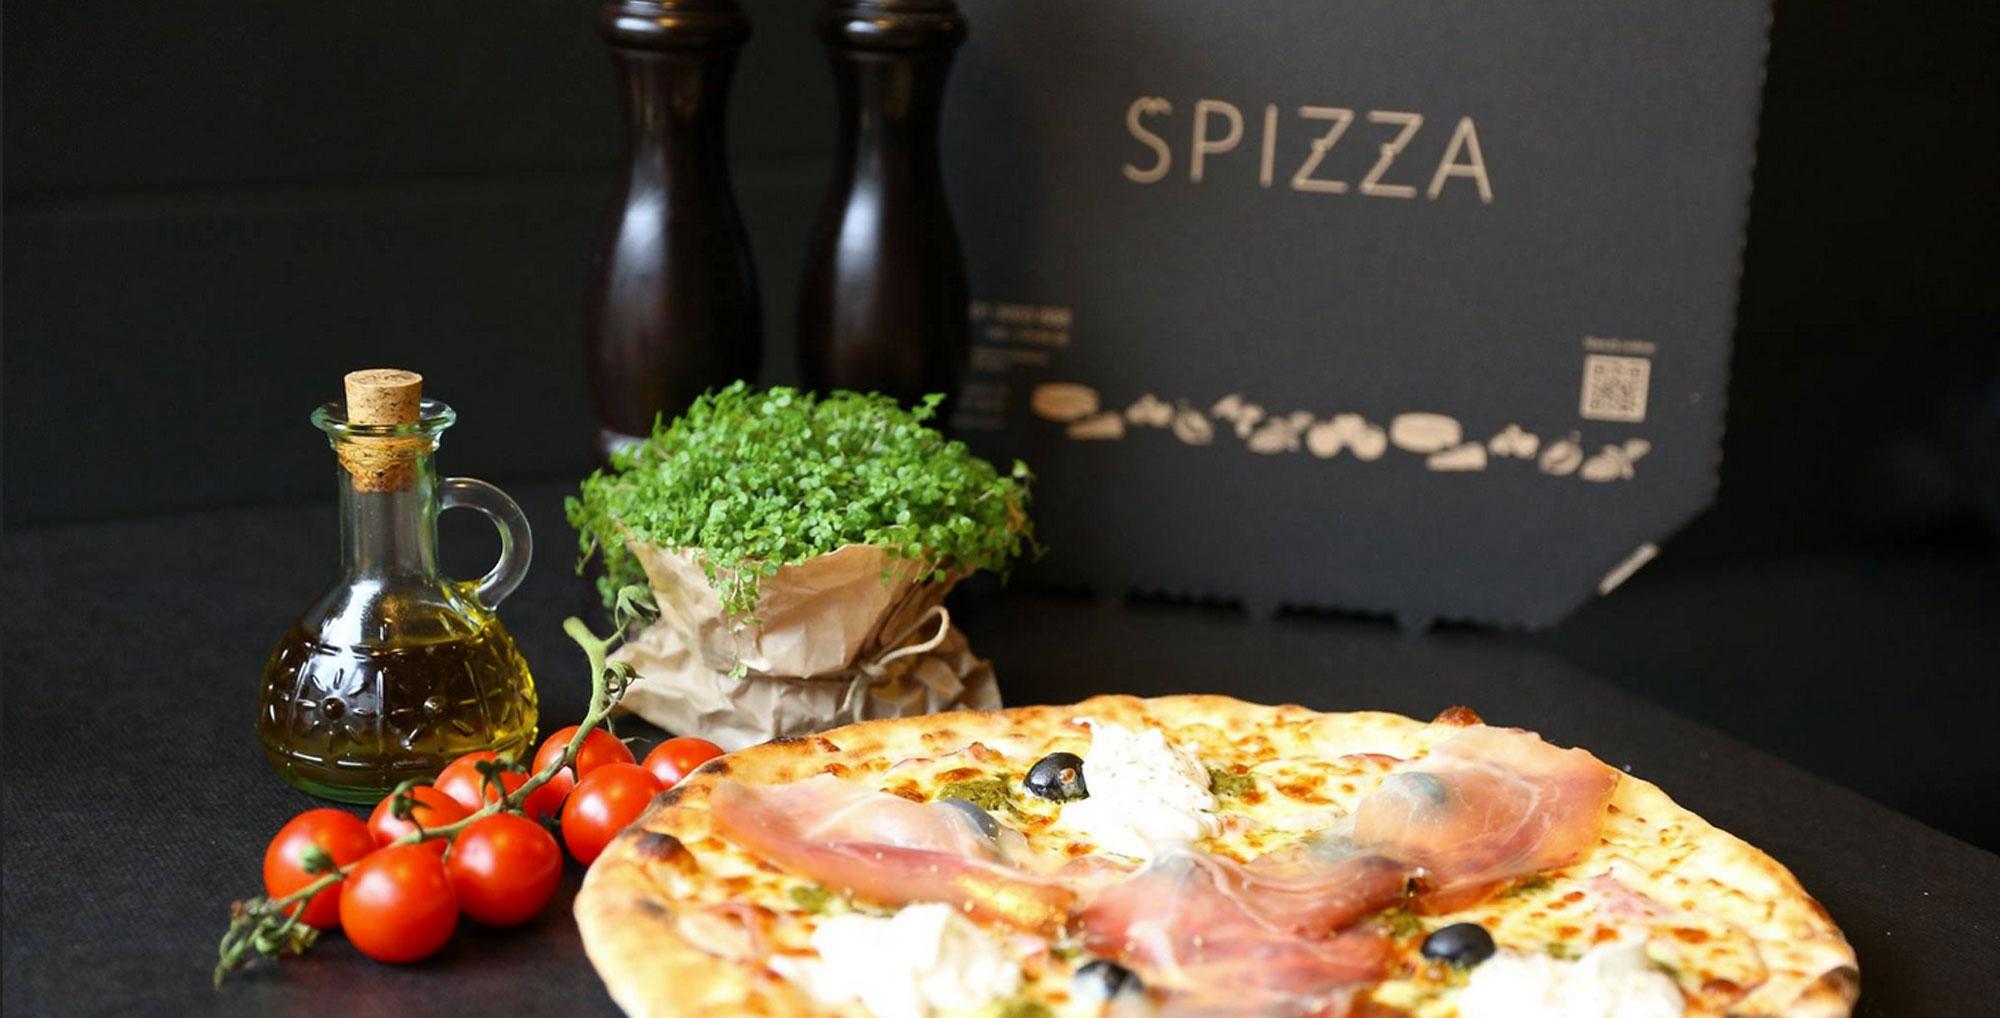 masavukmanovic.com - spizza - visual identity 04